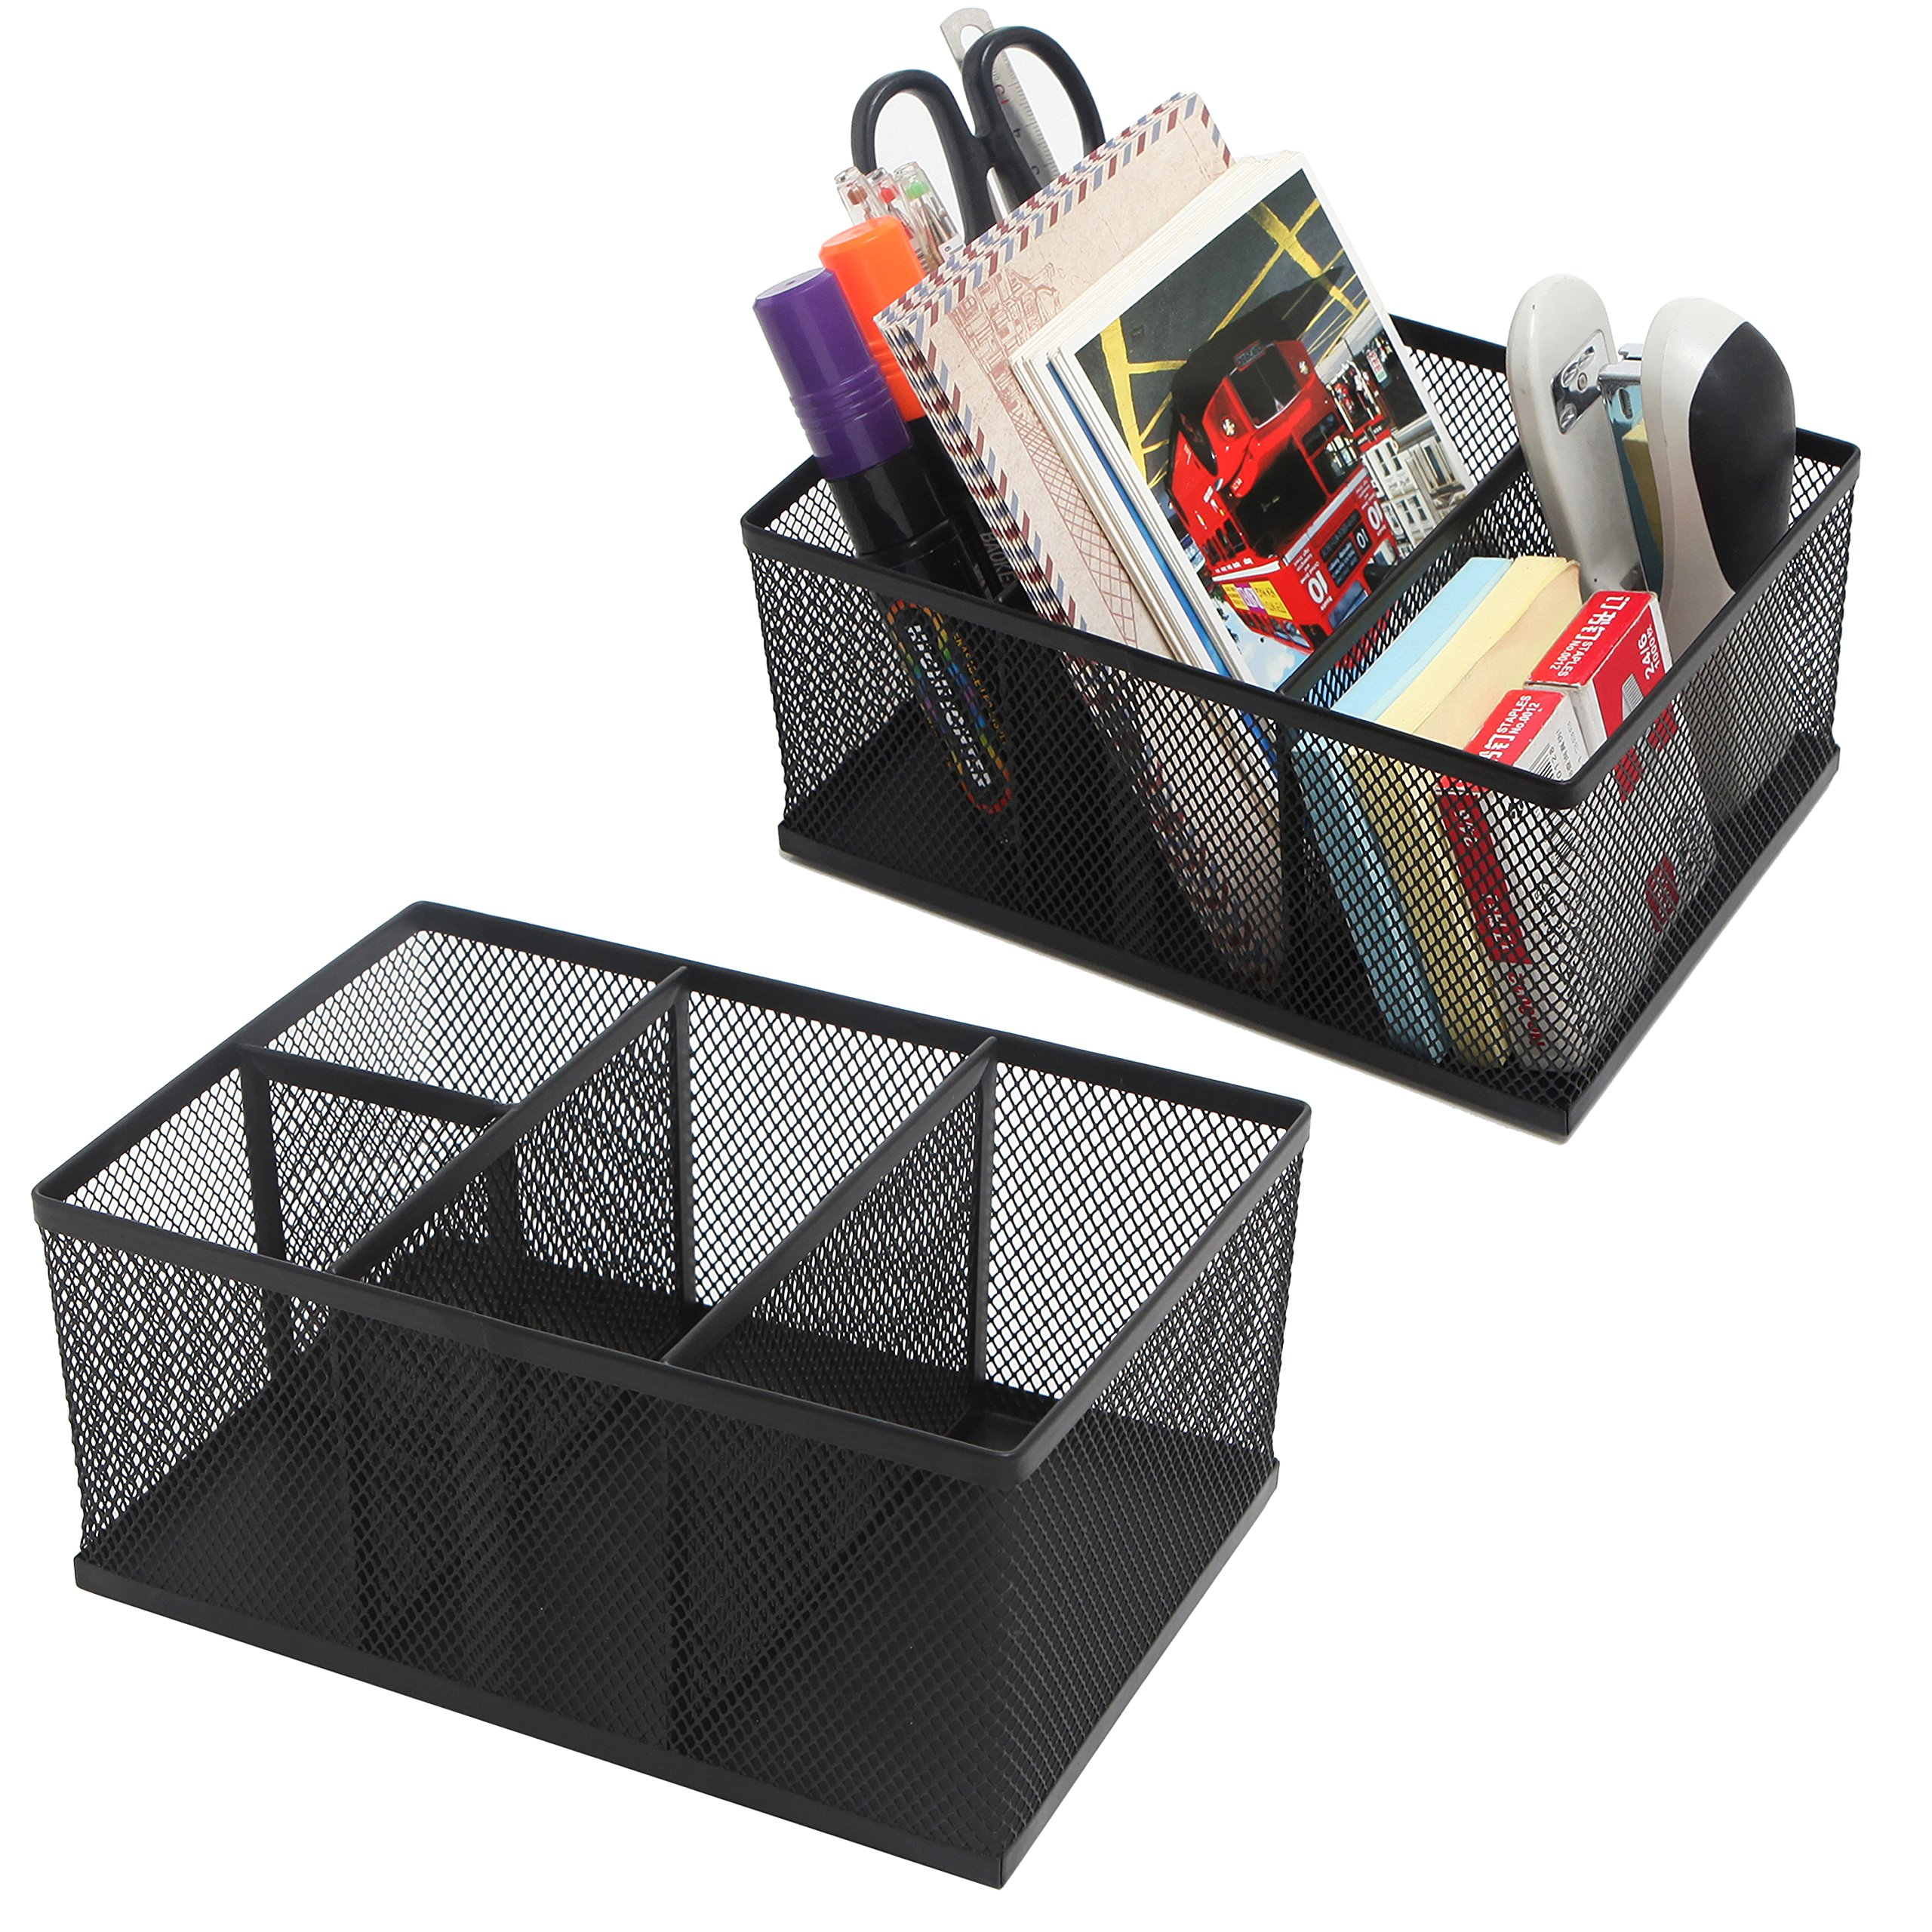 MyGIft Modern Metal Mesh Desktop Office Supply Organizers, Set of 2